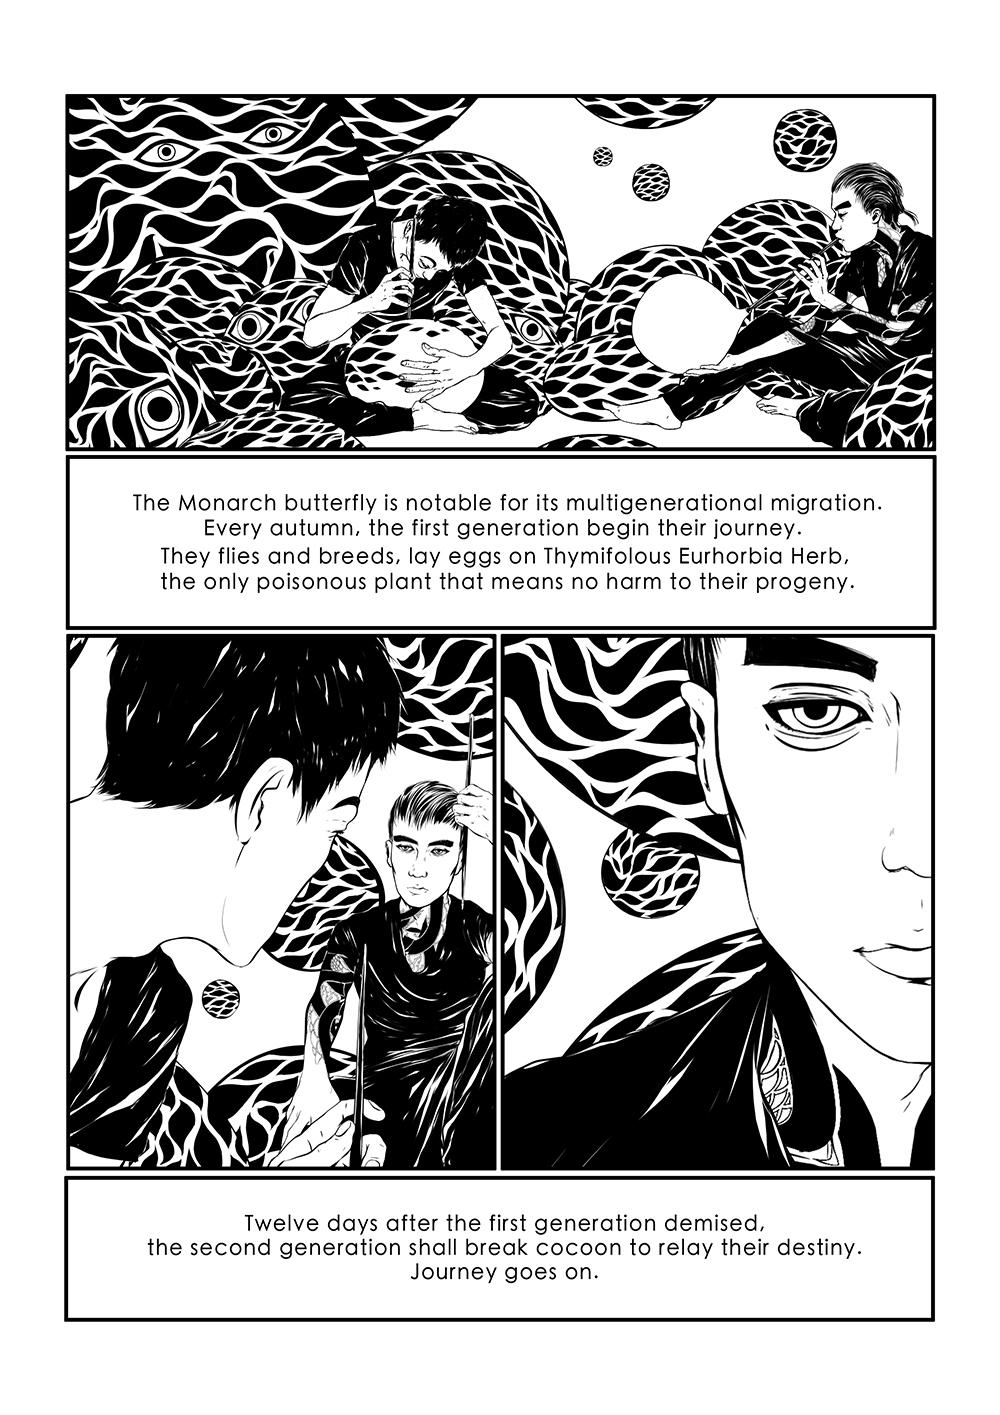 mojowang_illustration_betweenrivers_25_3.jpg